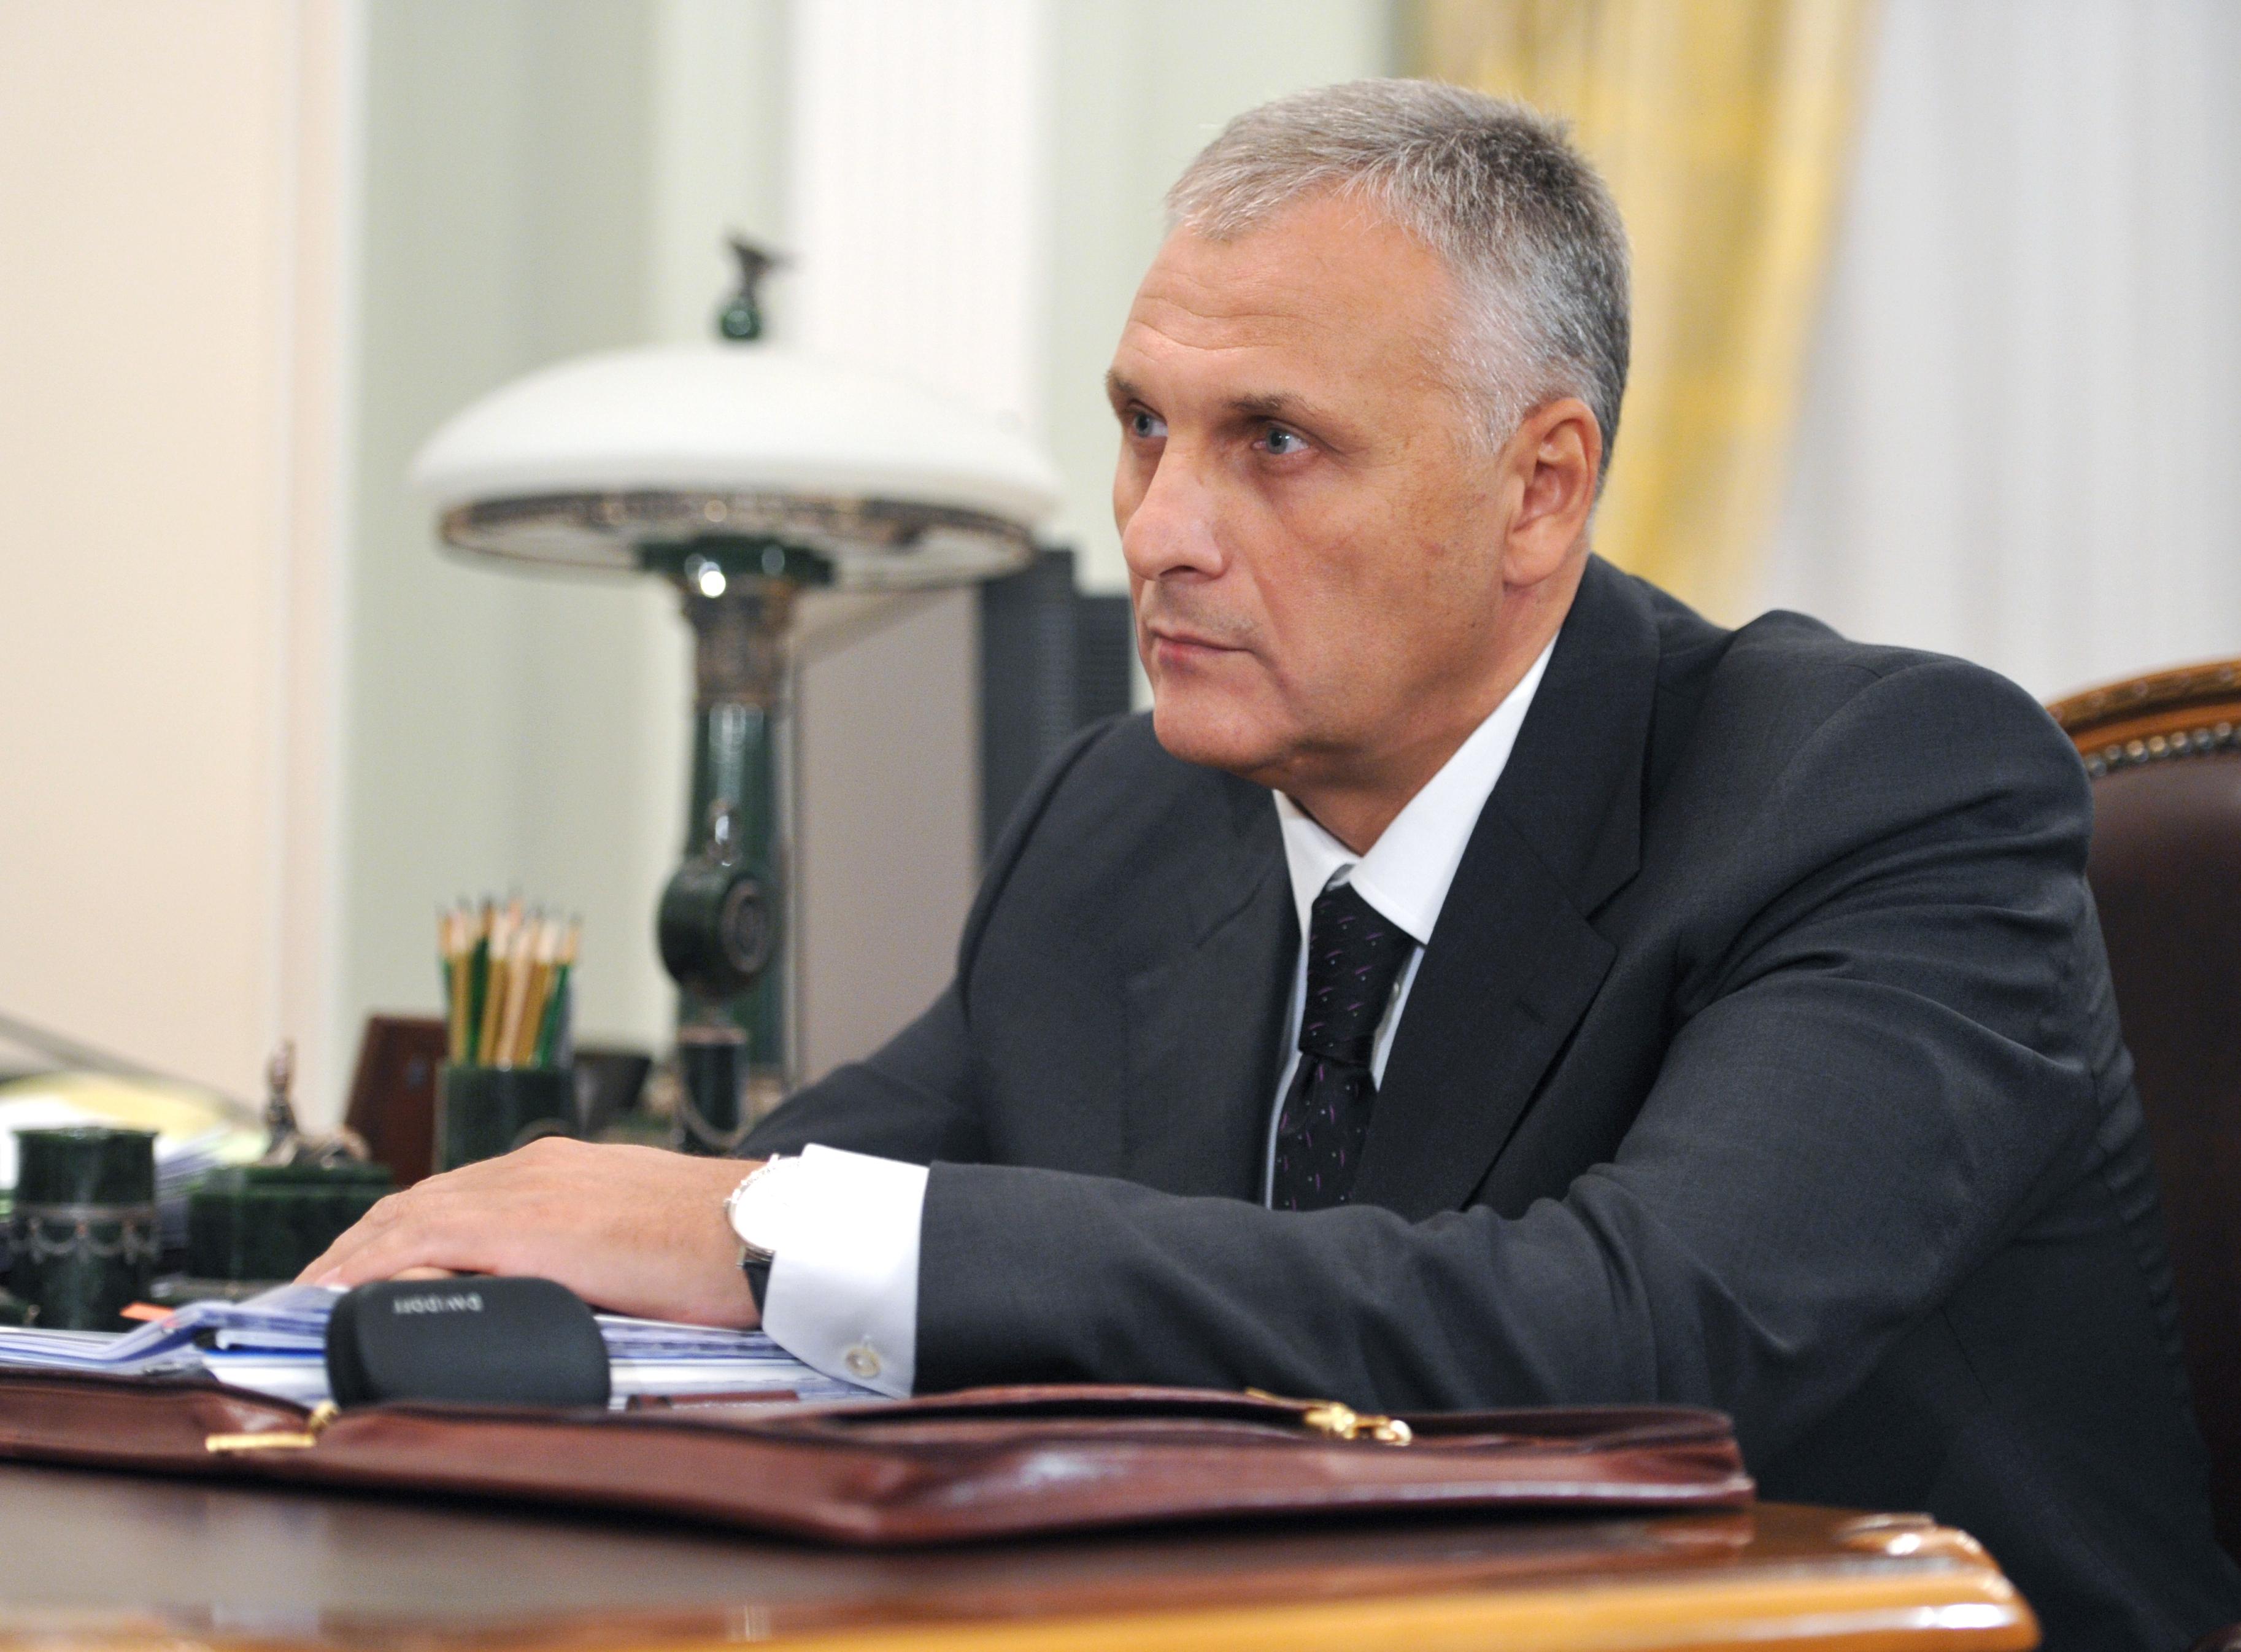 Хорошавин, Александр Вадимович — Википедия